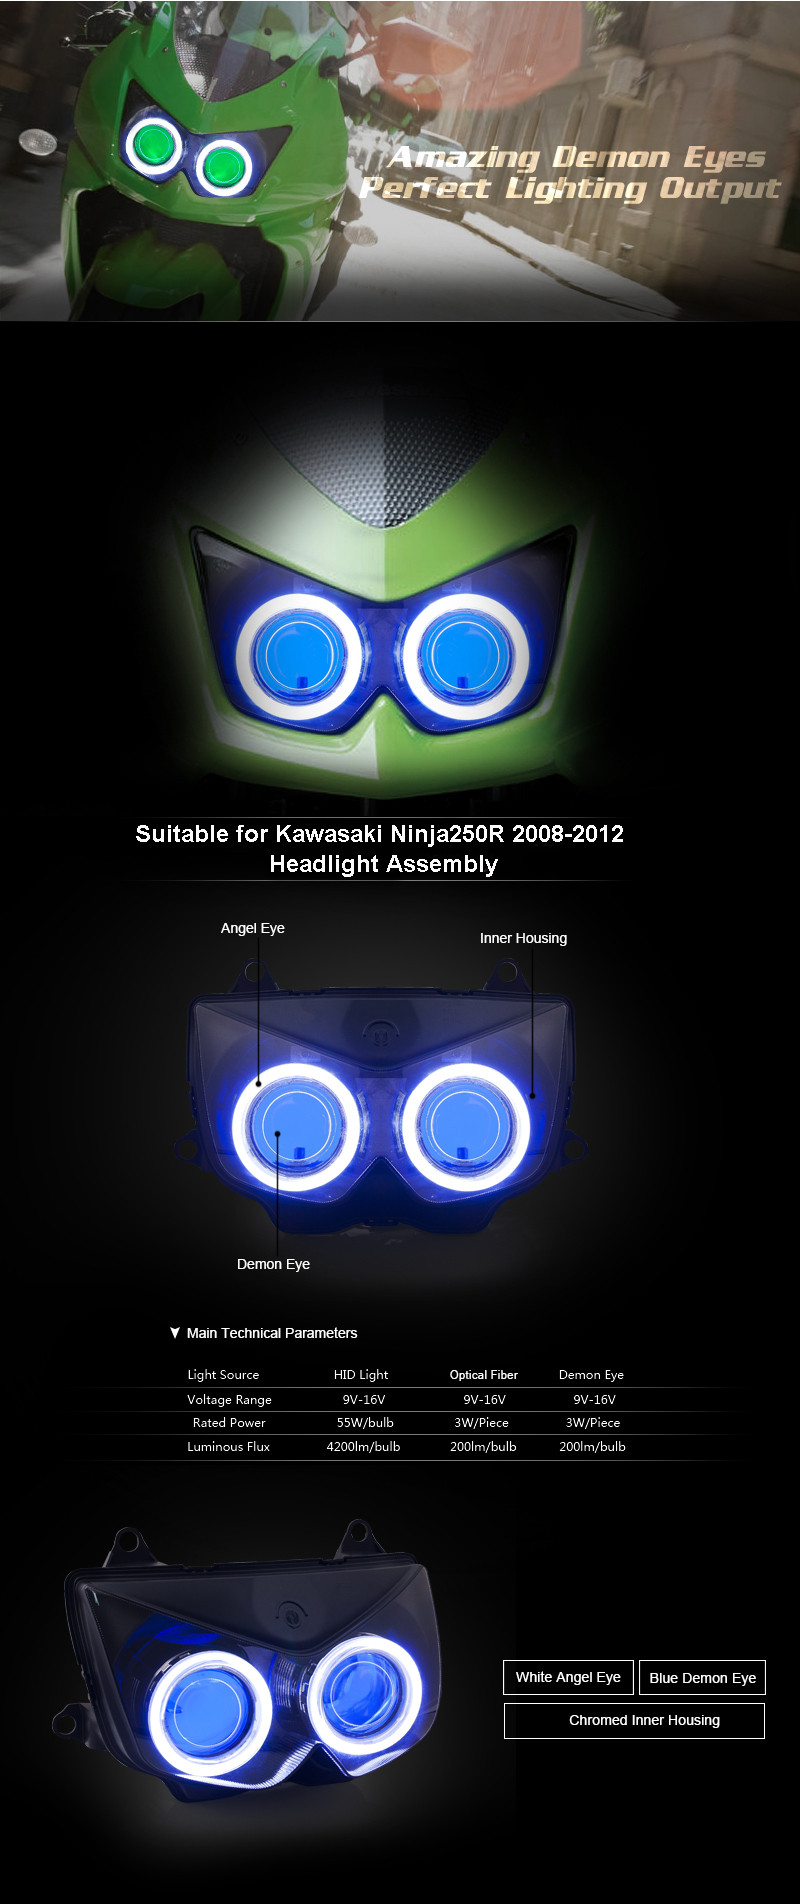 KT Headlight for Kawasaki Ninja 250R 2008-2012 LED Angel Eye Blue Demon Eye Motorcycle HID Projector Assembly 2009 2010 2011